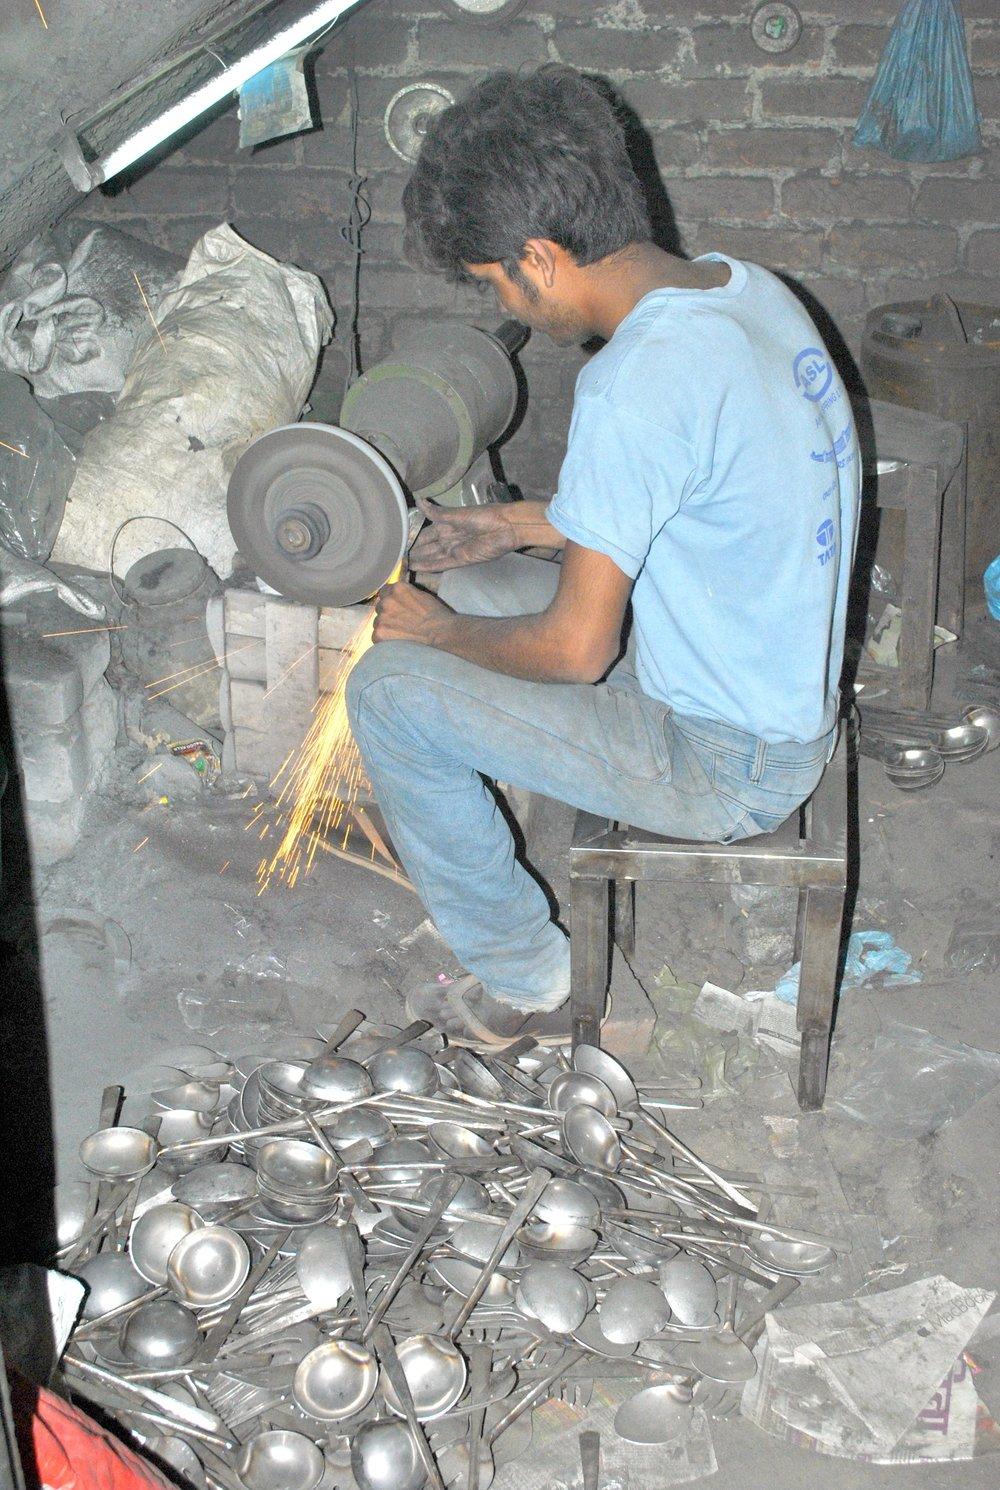 Bablu hand forges ladels for Kazmi Emporium, Moradabad.